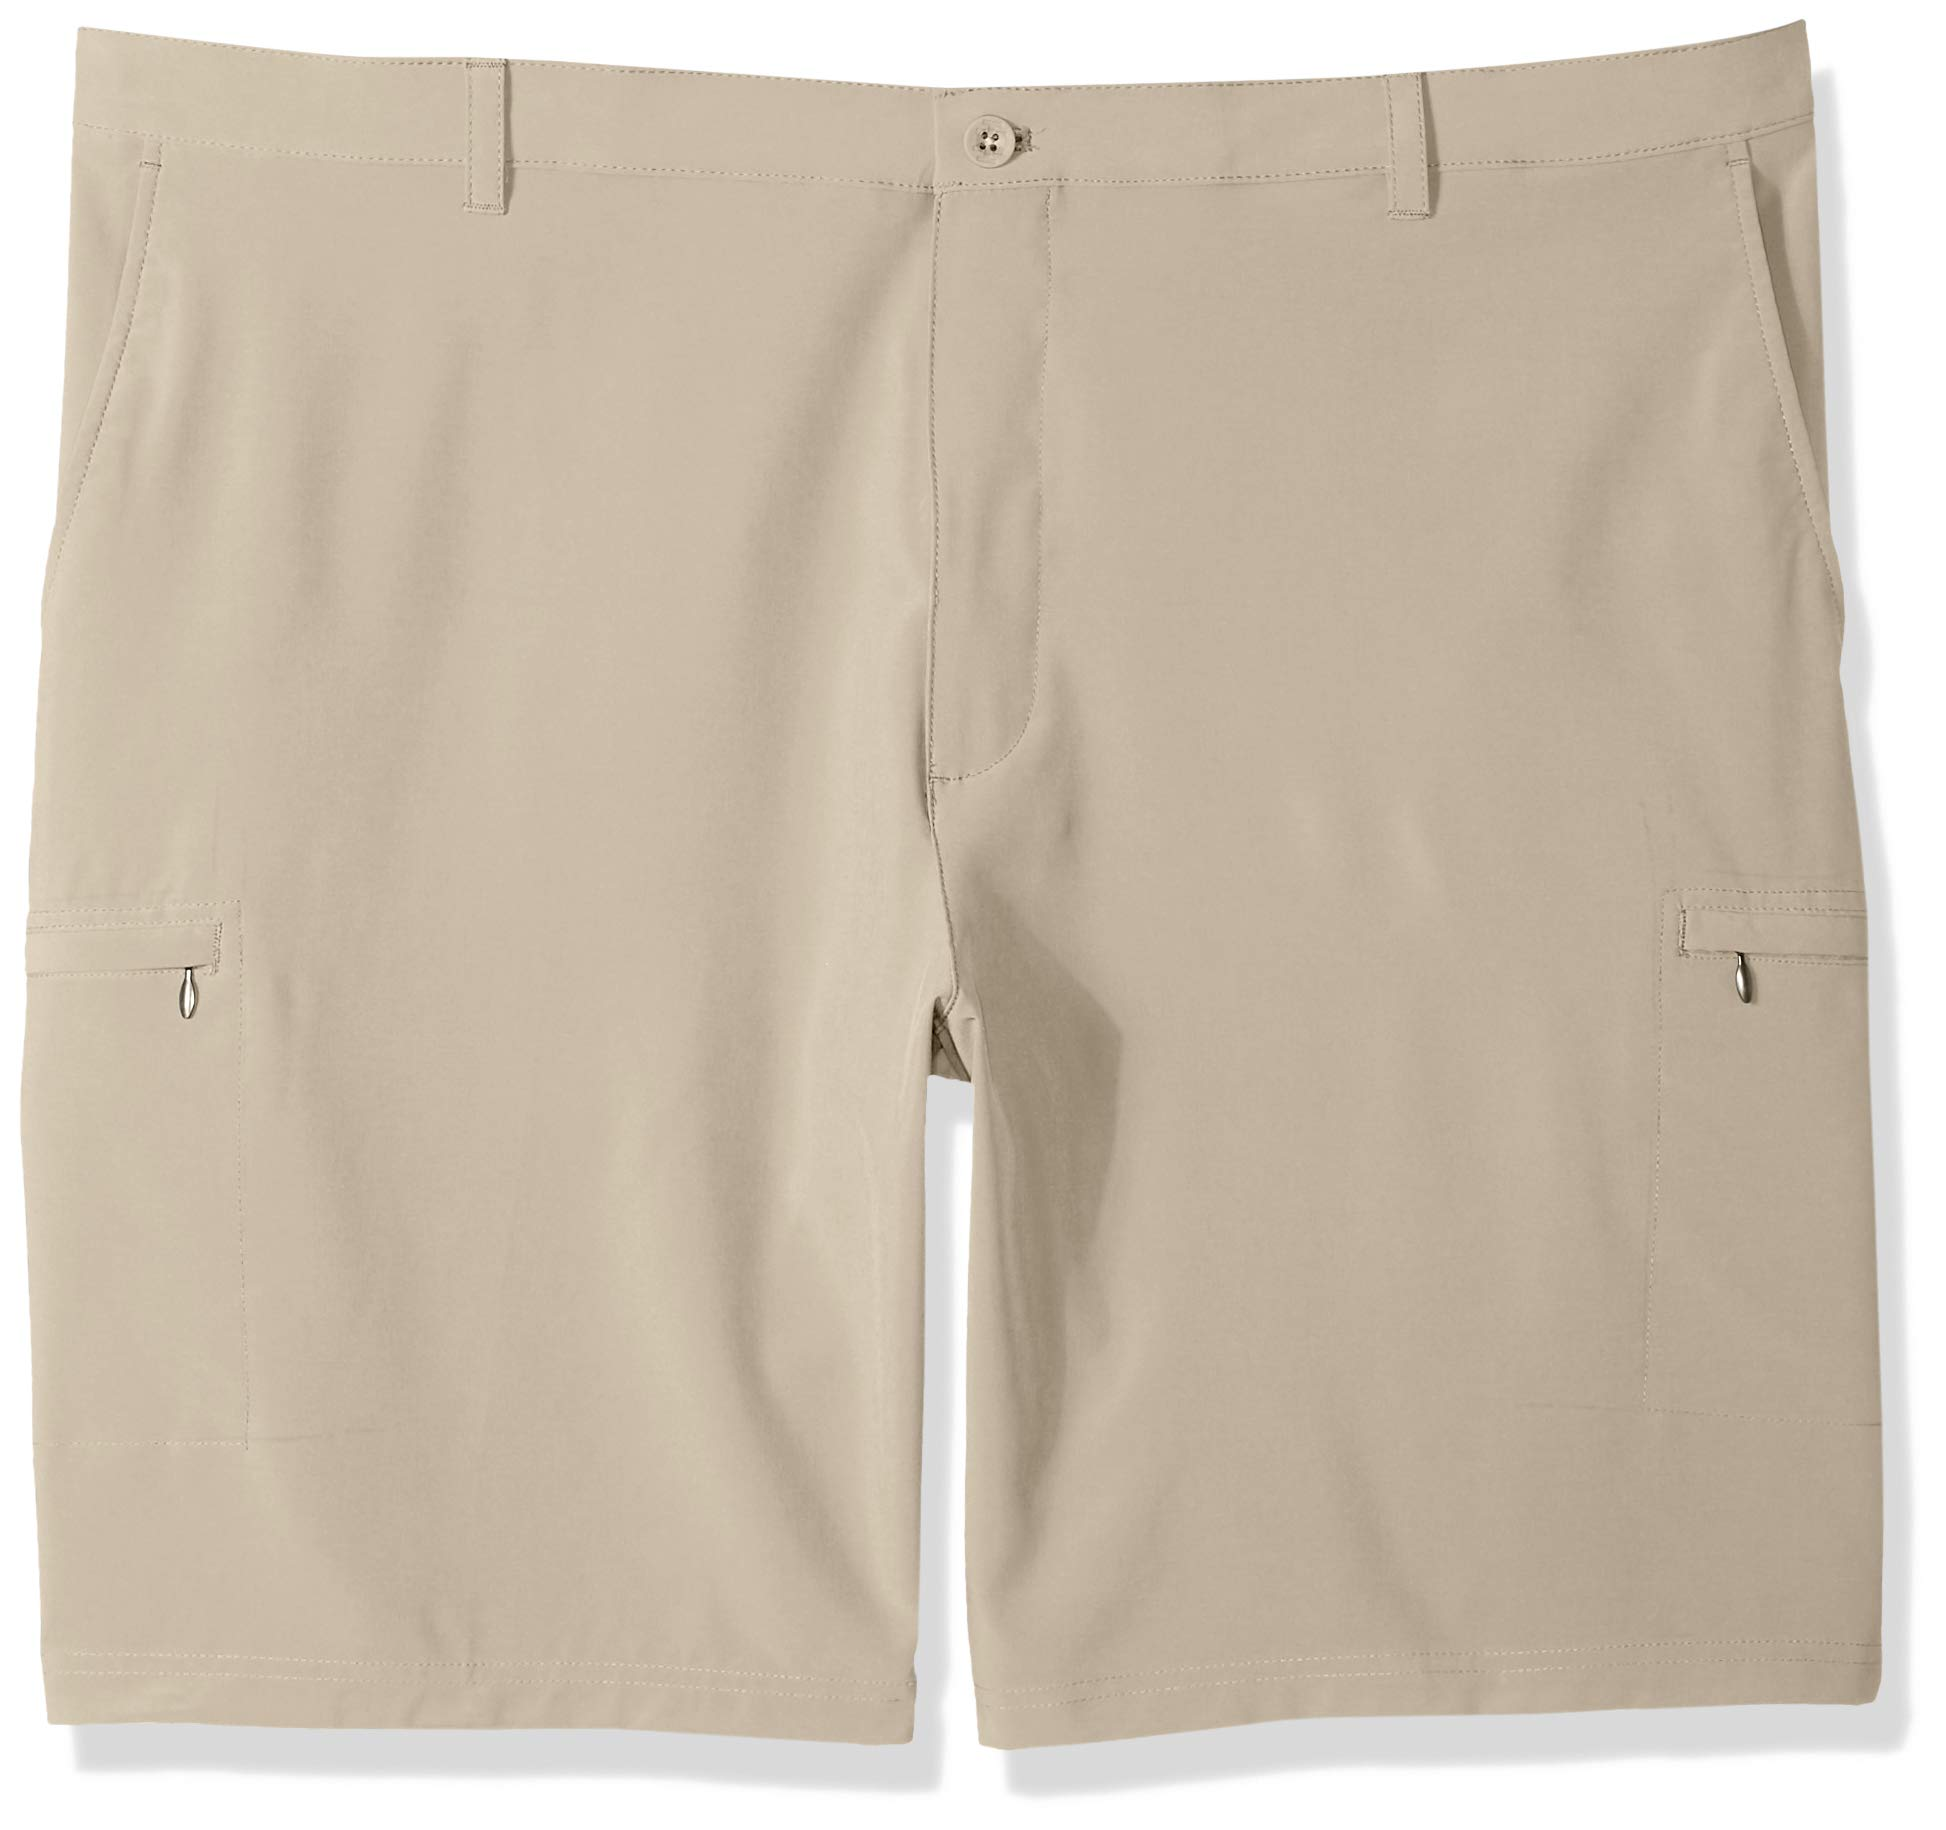 IZOD Men's Big and Tall Golf Swing Flex Stretch Cargo Short, red Khaki, 48